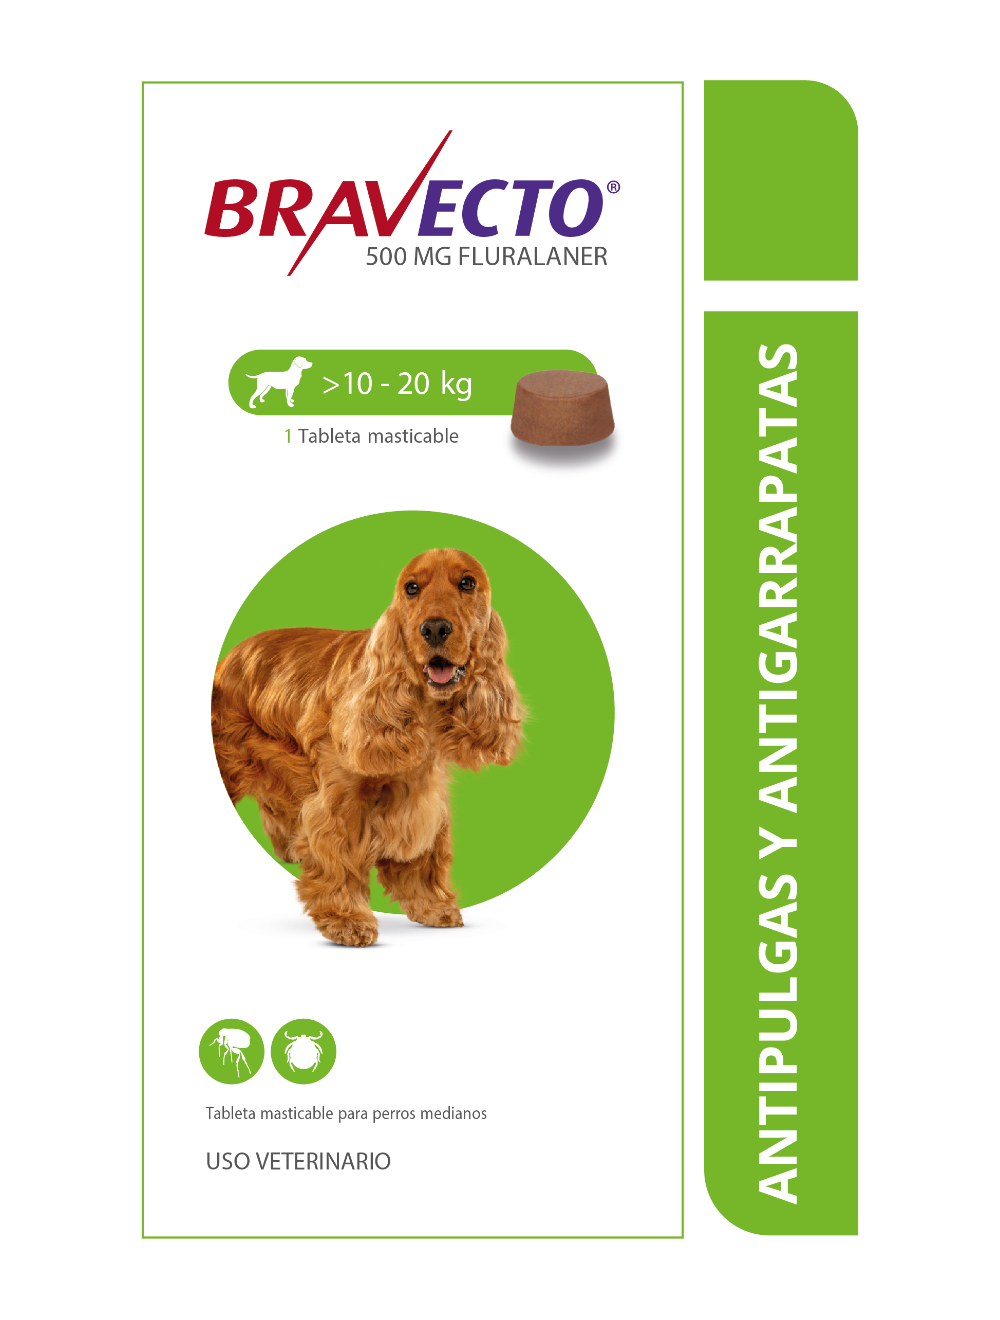 Combo Bravecto Perros de 10 a 20 Kg x 3 unidades - Ciudaddemascotas.com